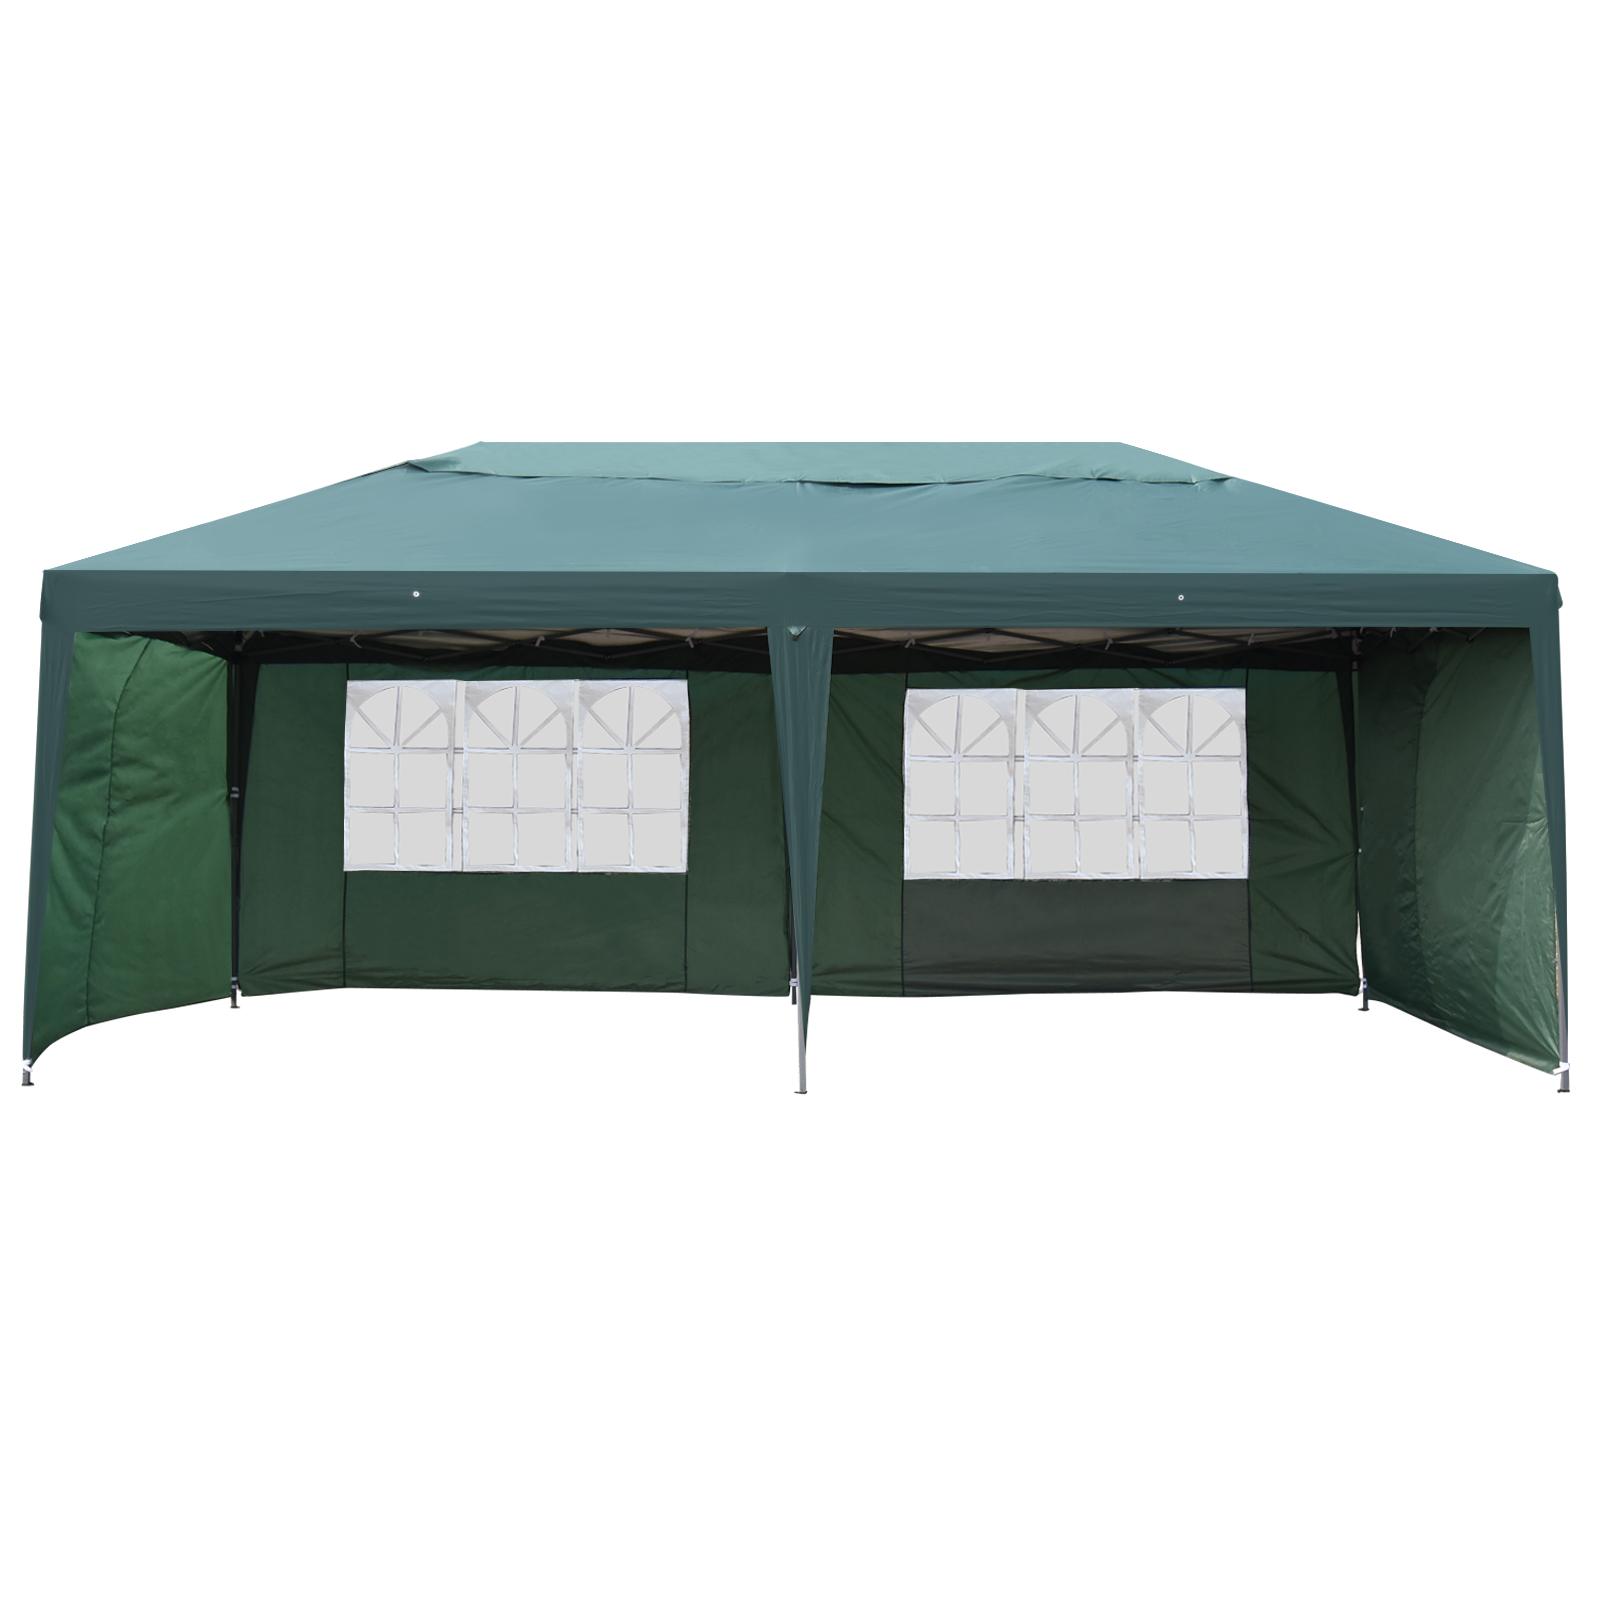 Outdoor-10-039-x20-039-EZ-POP-UP-Gazebo-Wedding-Party-Tent-Canopy-Folding-w-Carry-Bag thumbnail 24